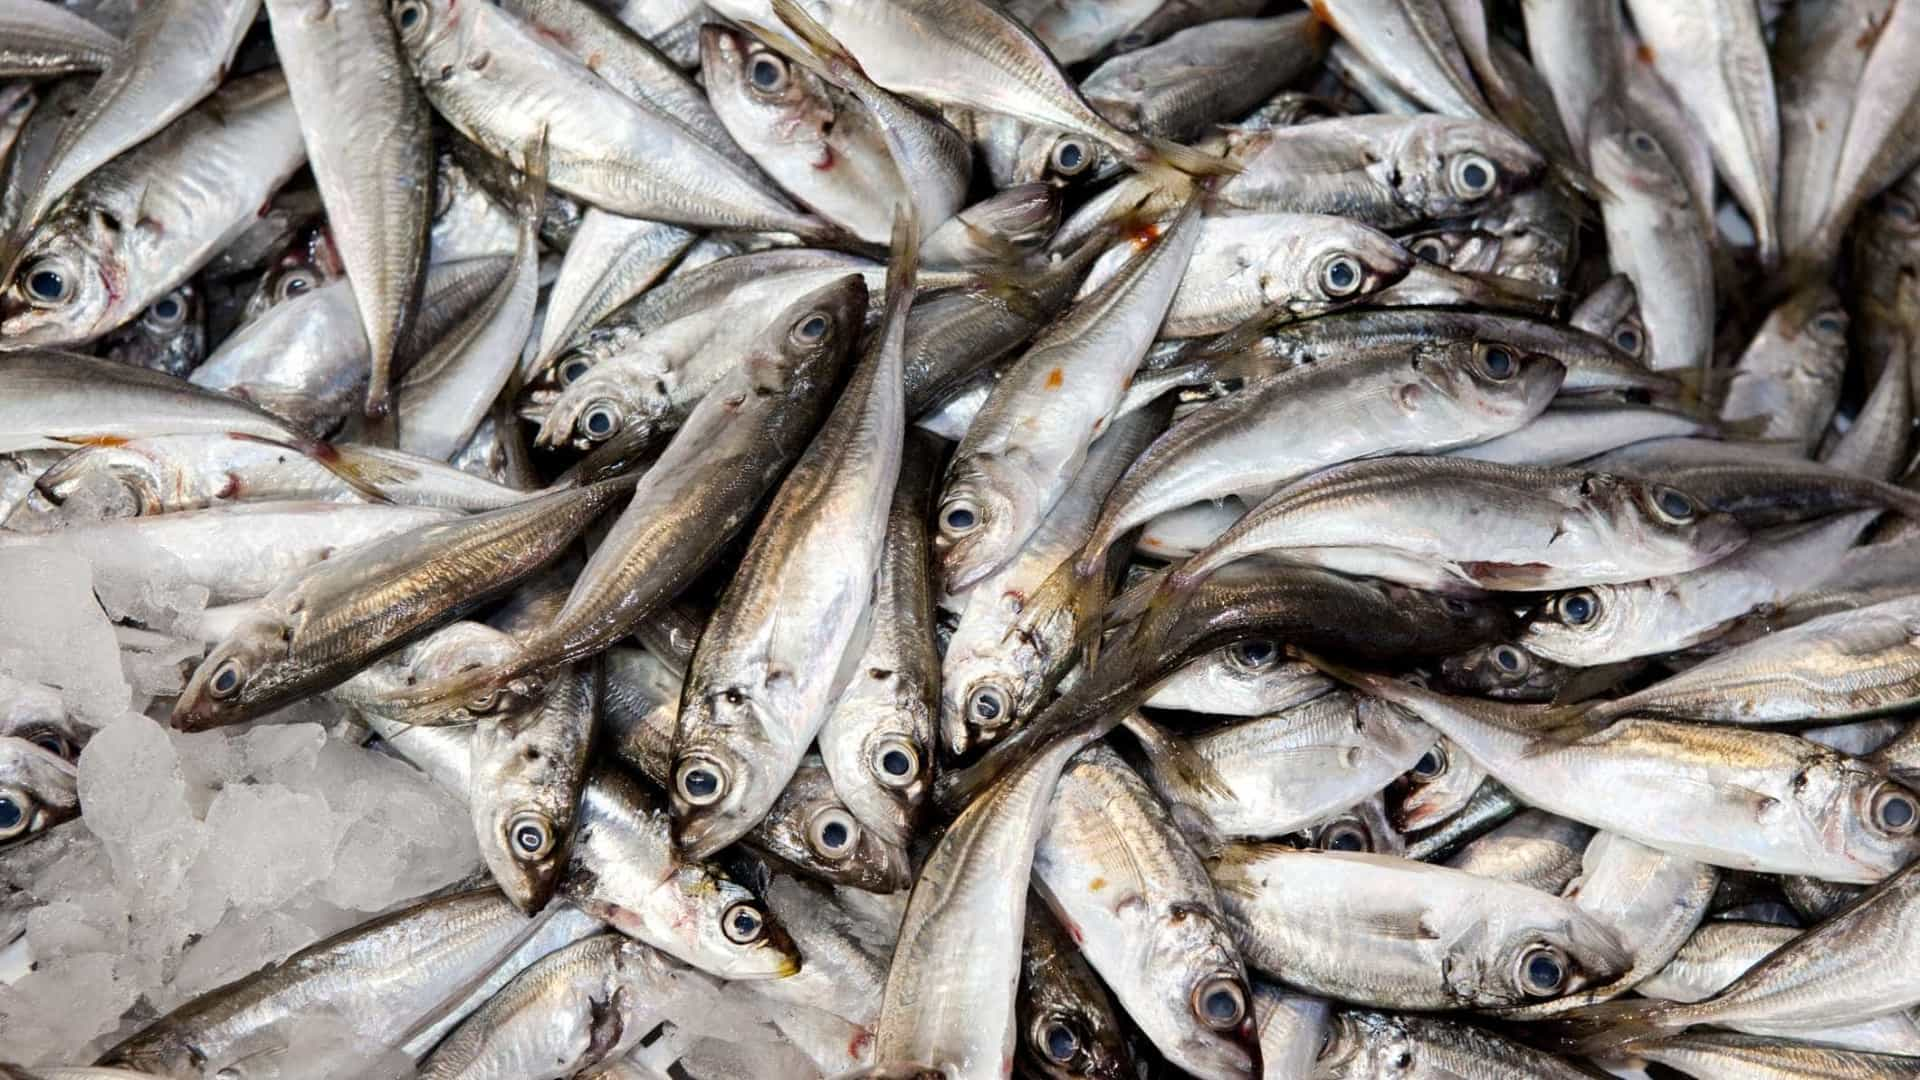 Apoios aos pescadores chegam até ao final de fevereiro, diz Governo